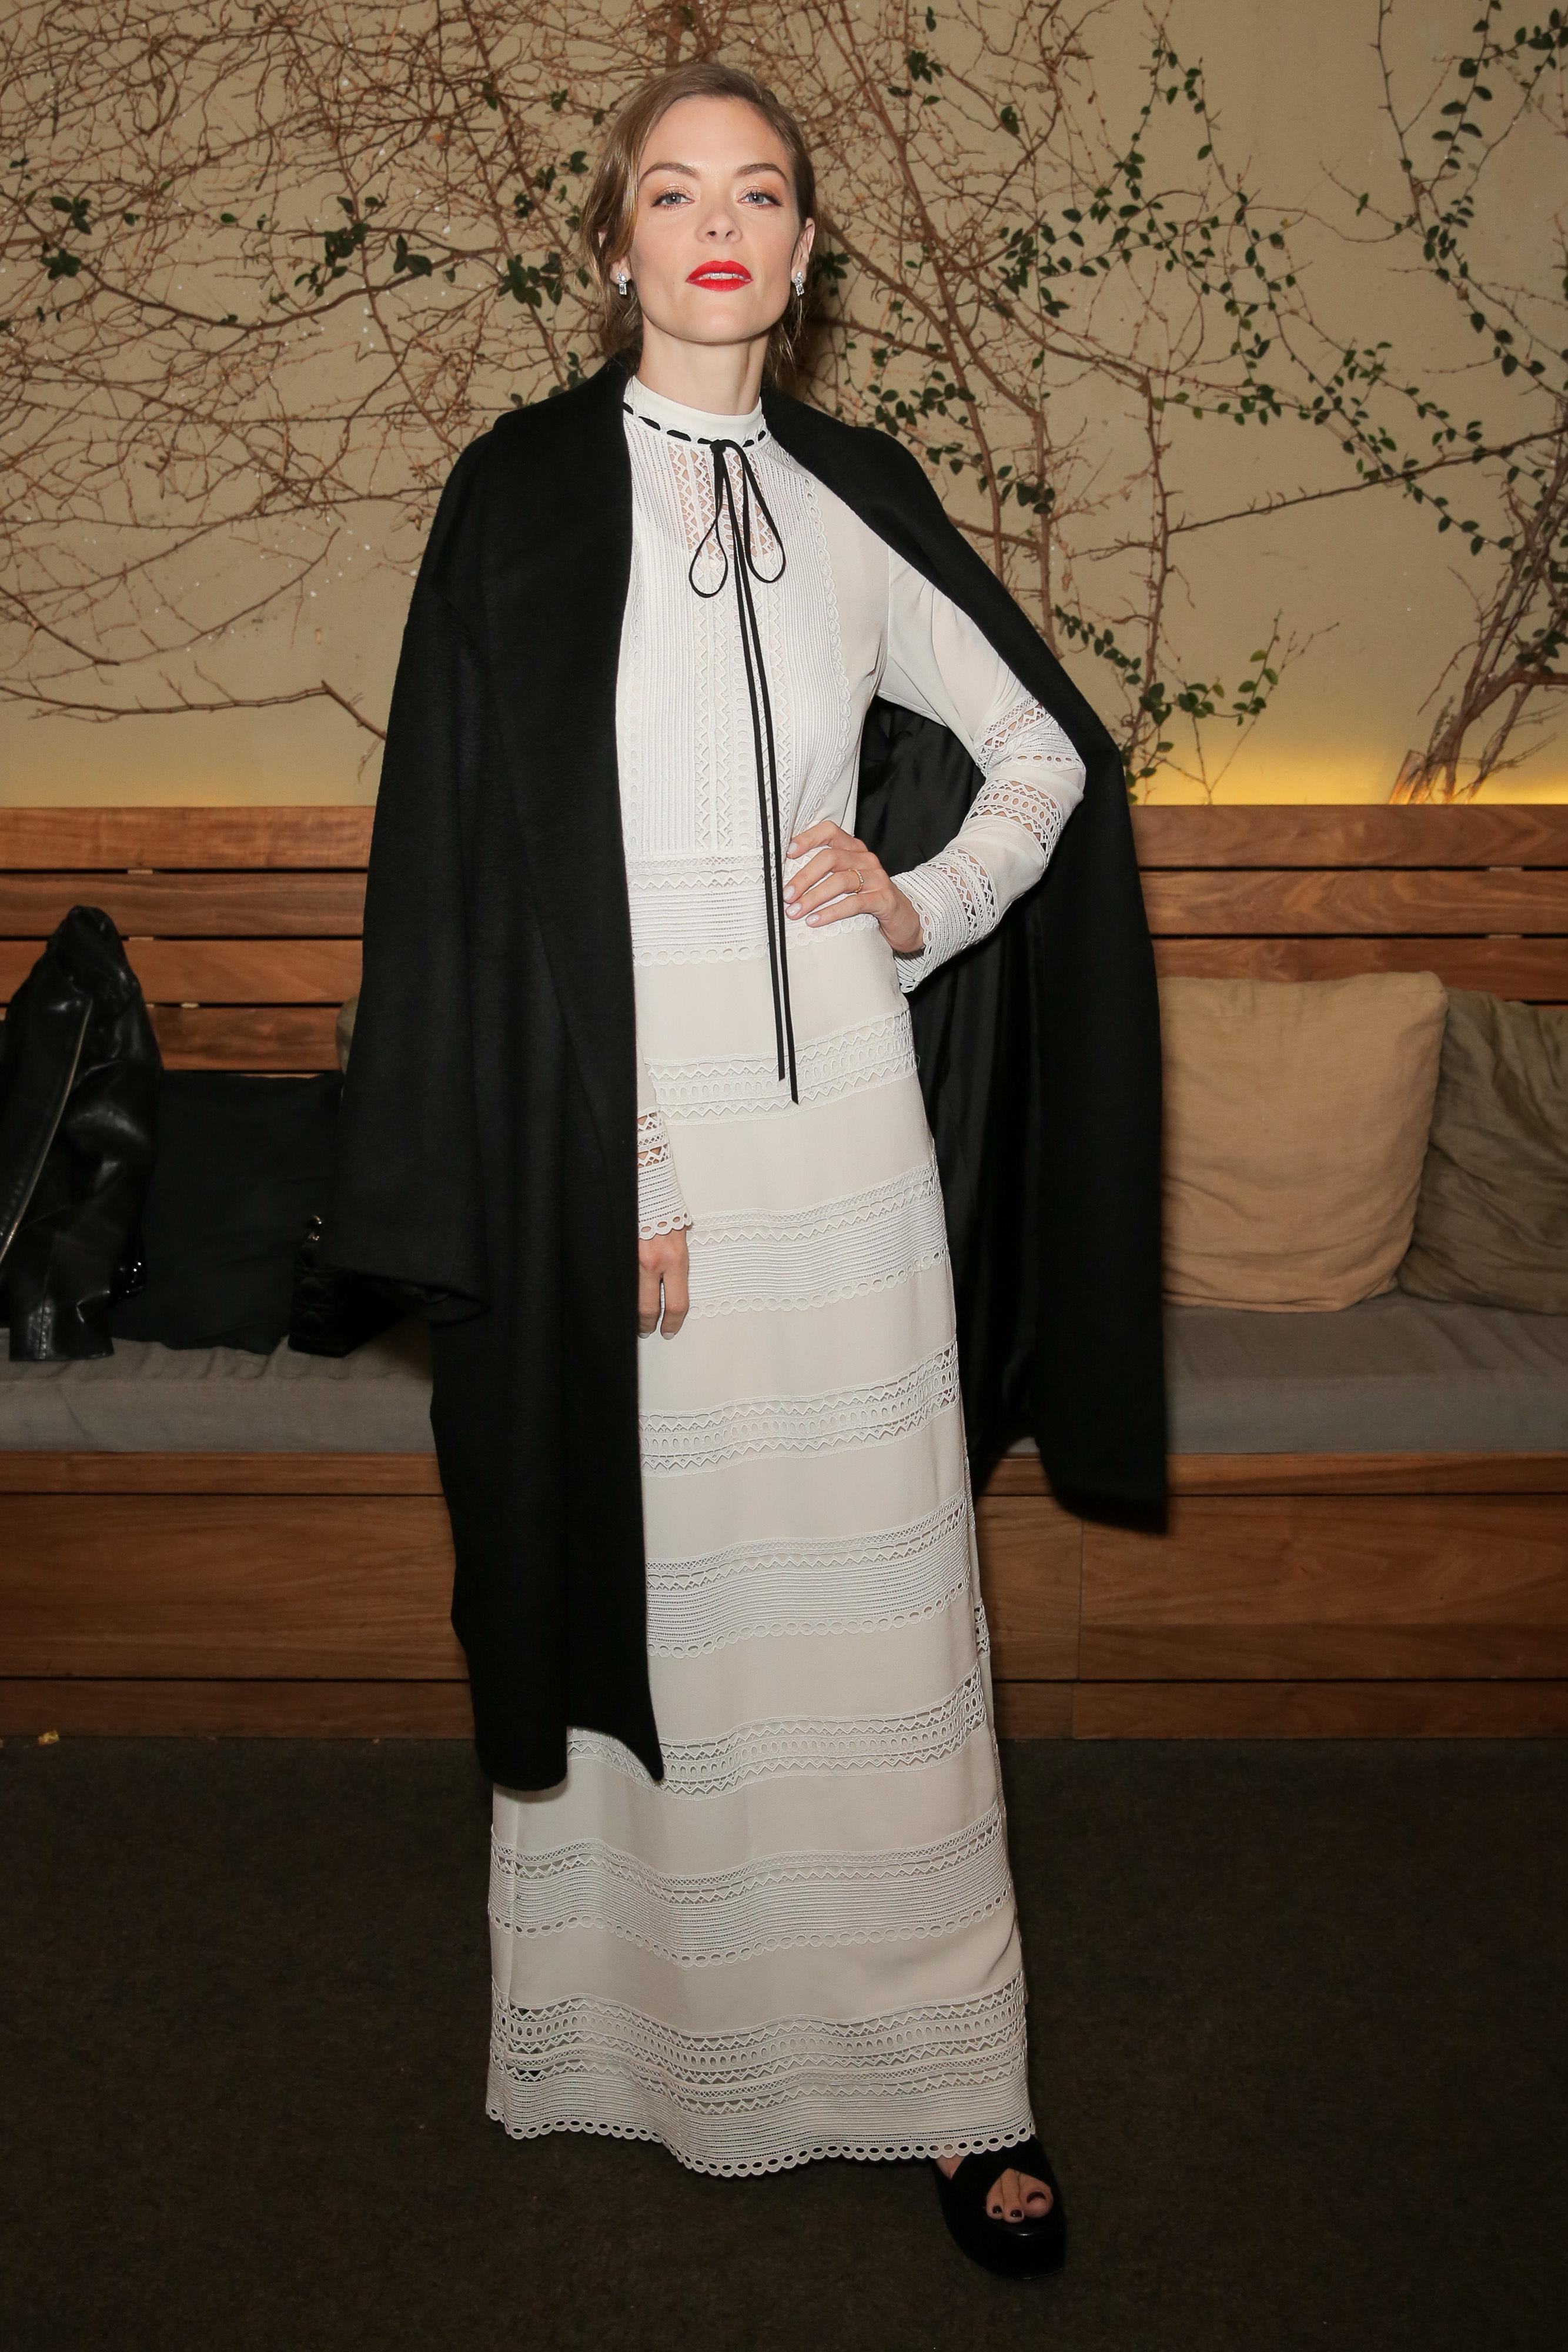 Jaime King sounds off on Johnny Depp, Amber Heard scandal